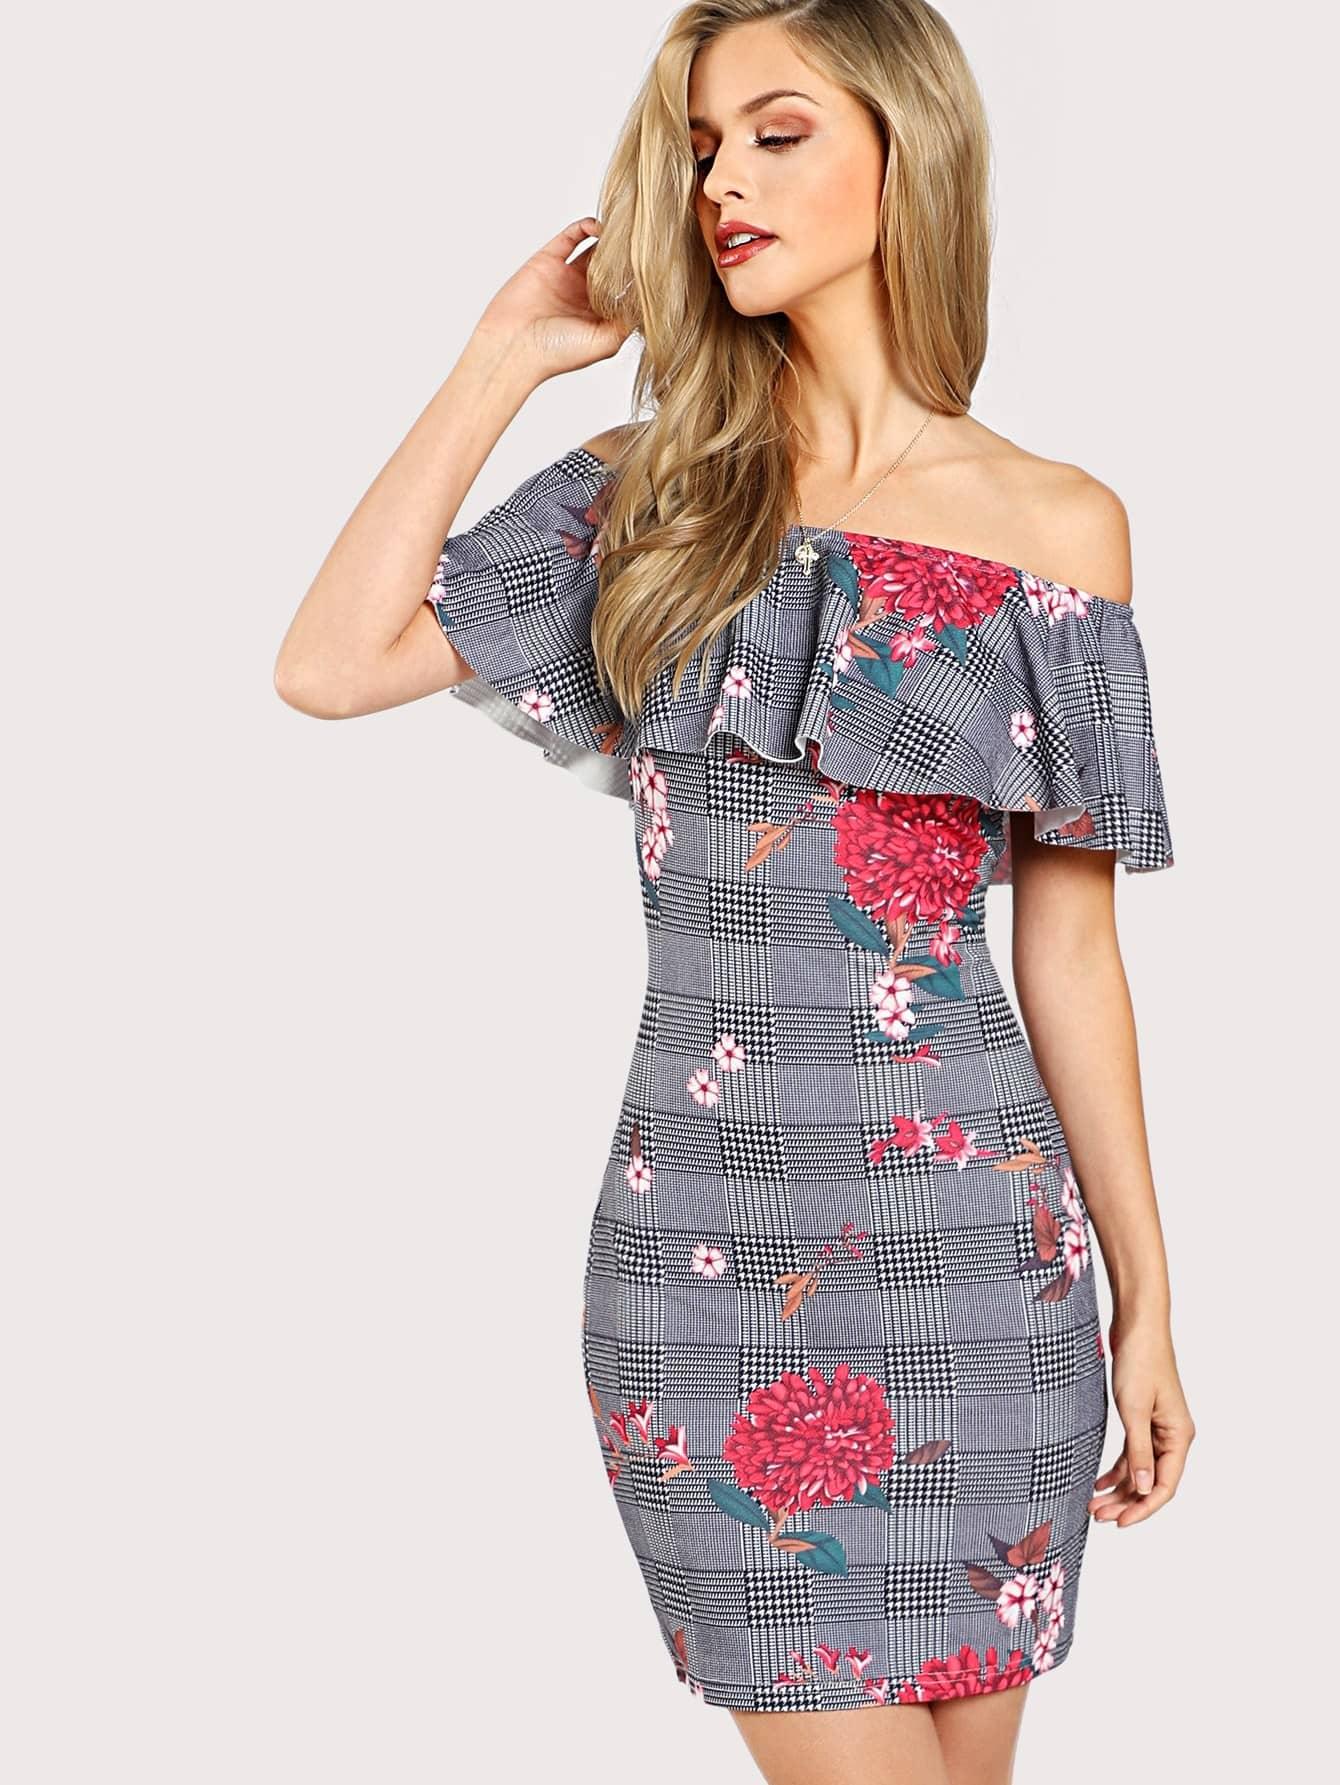 Mixed Print Flounce Layered Dress mixed print dress